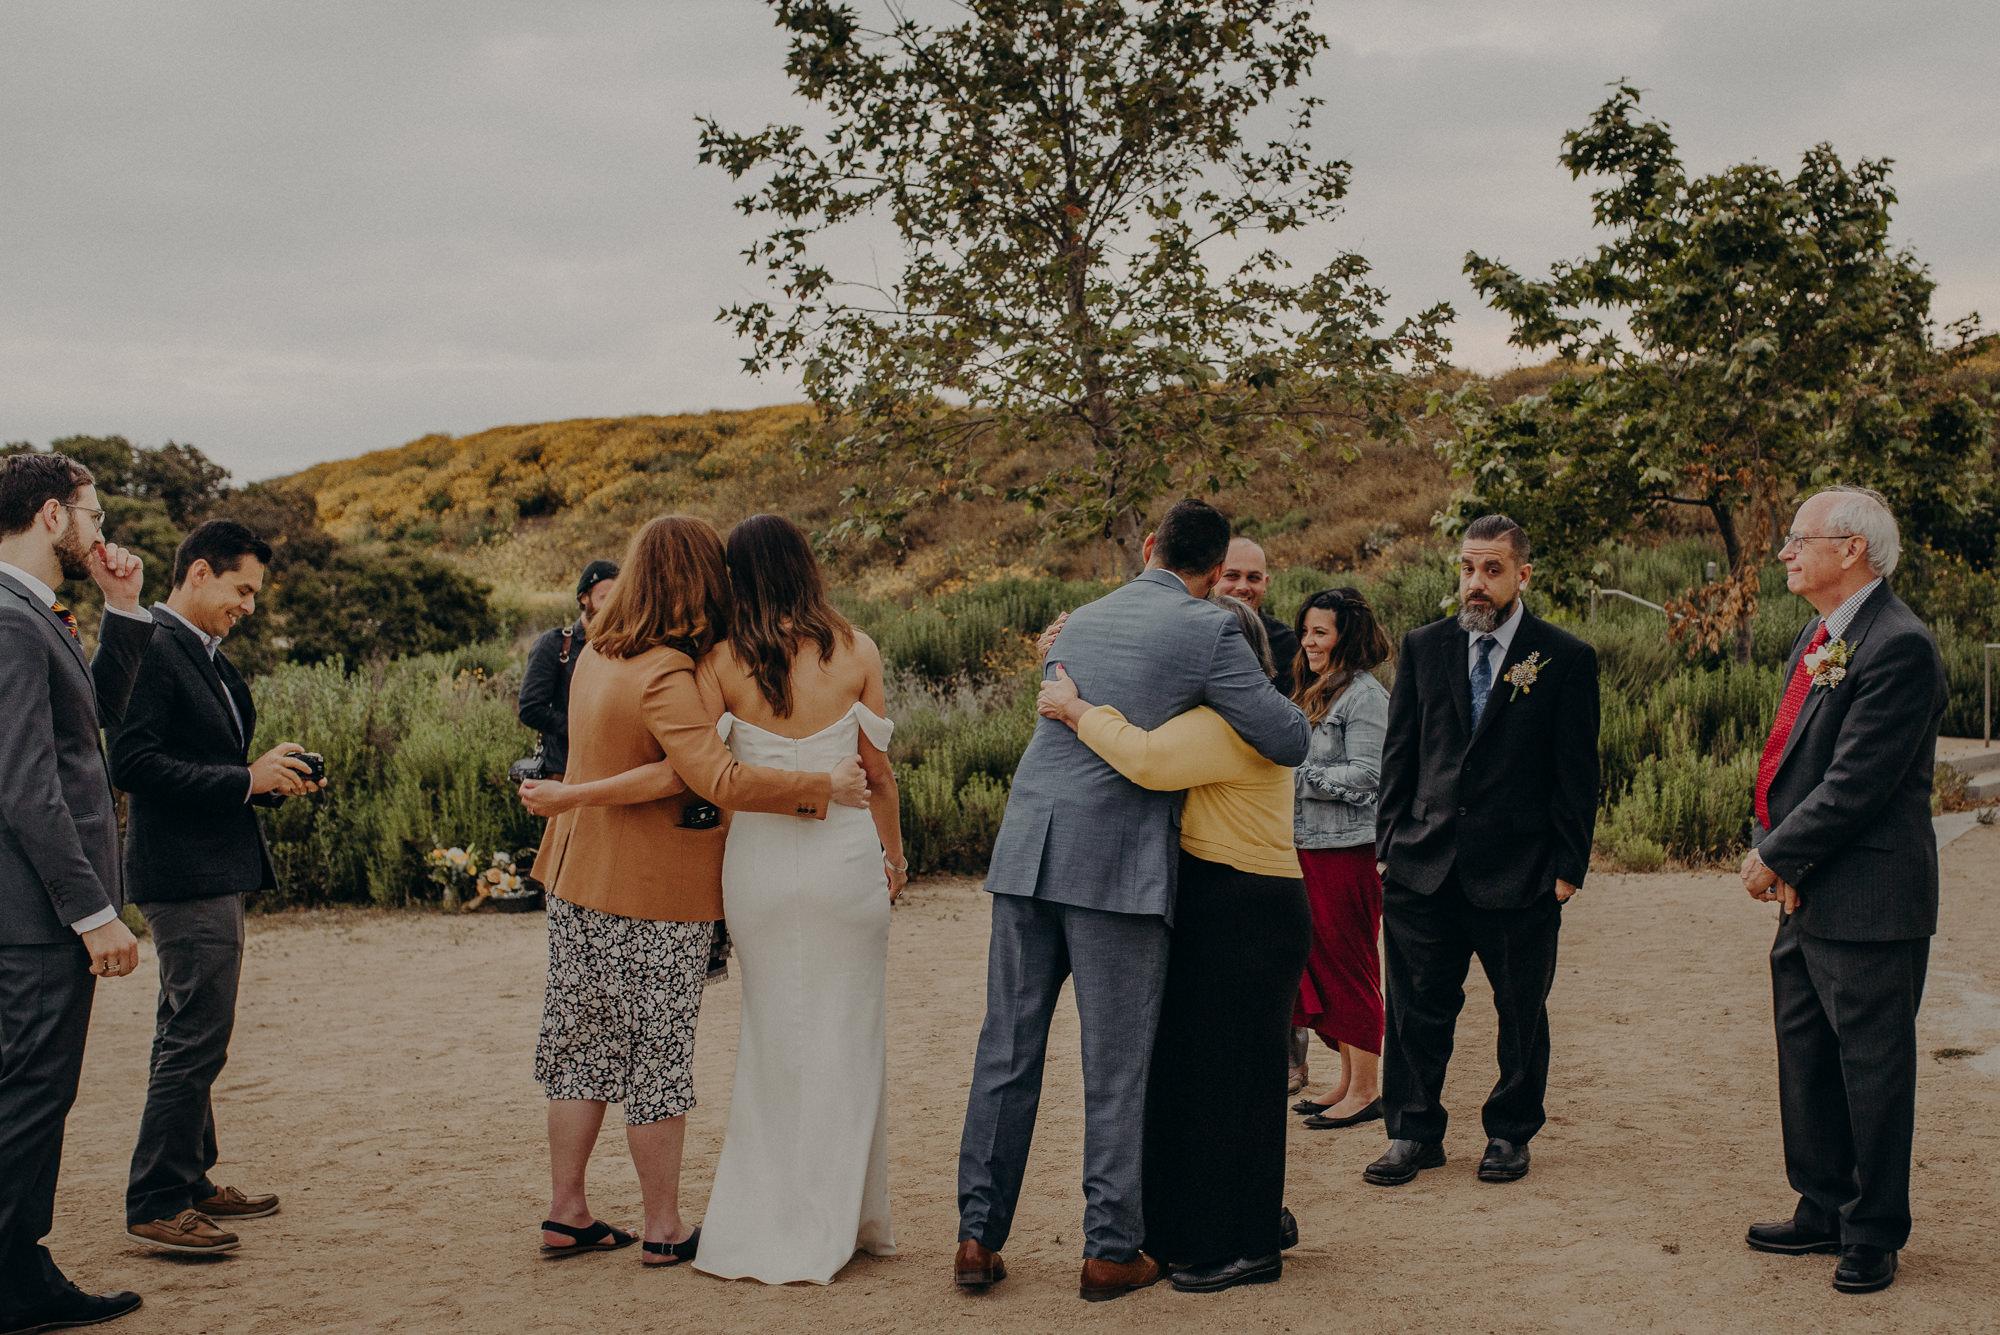 elopement photographer in los angeles - la wedding photographer - isaiahandtaylor.com-070.jpg